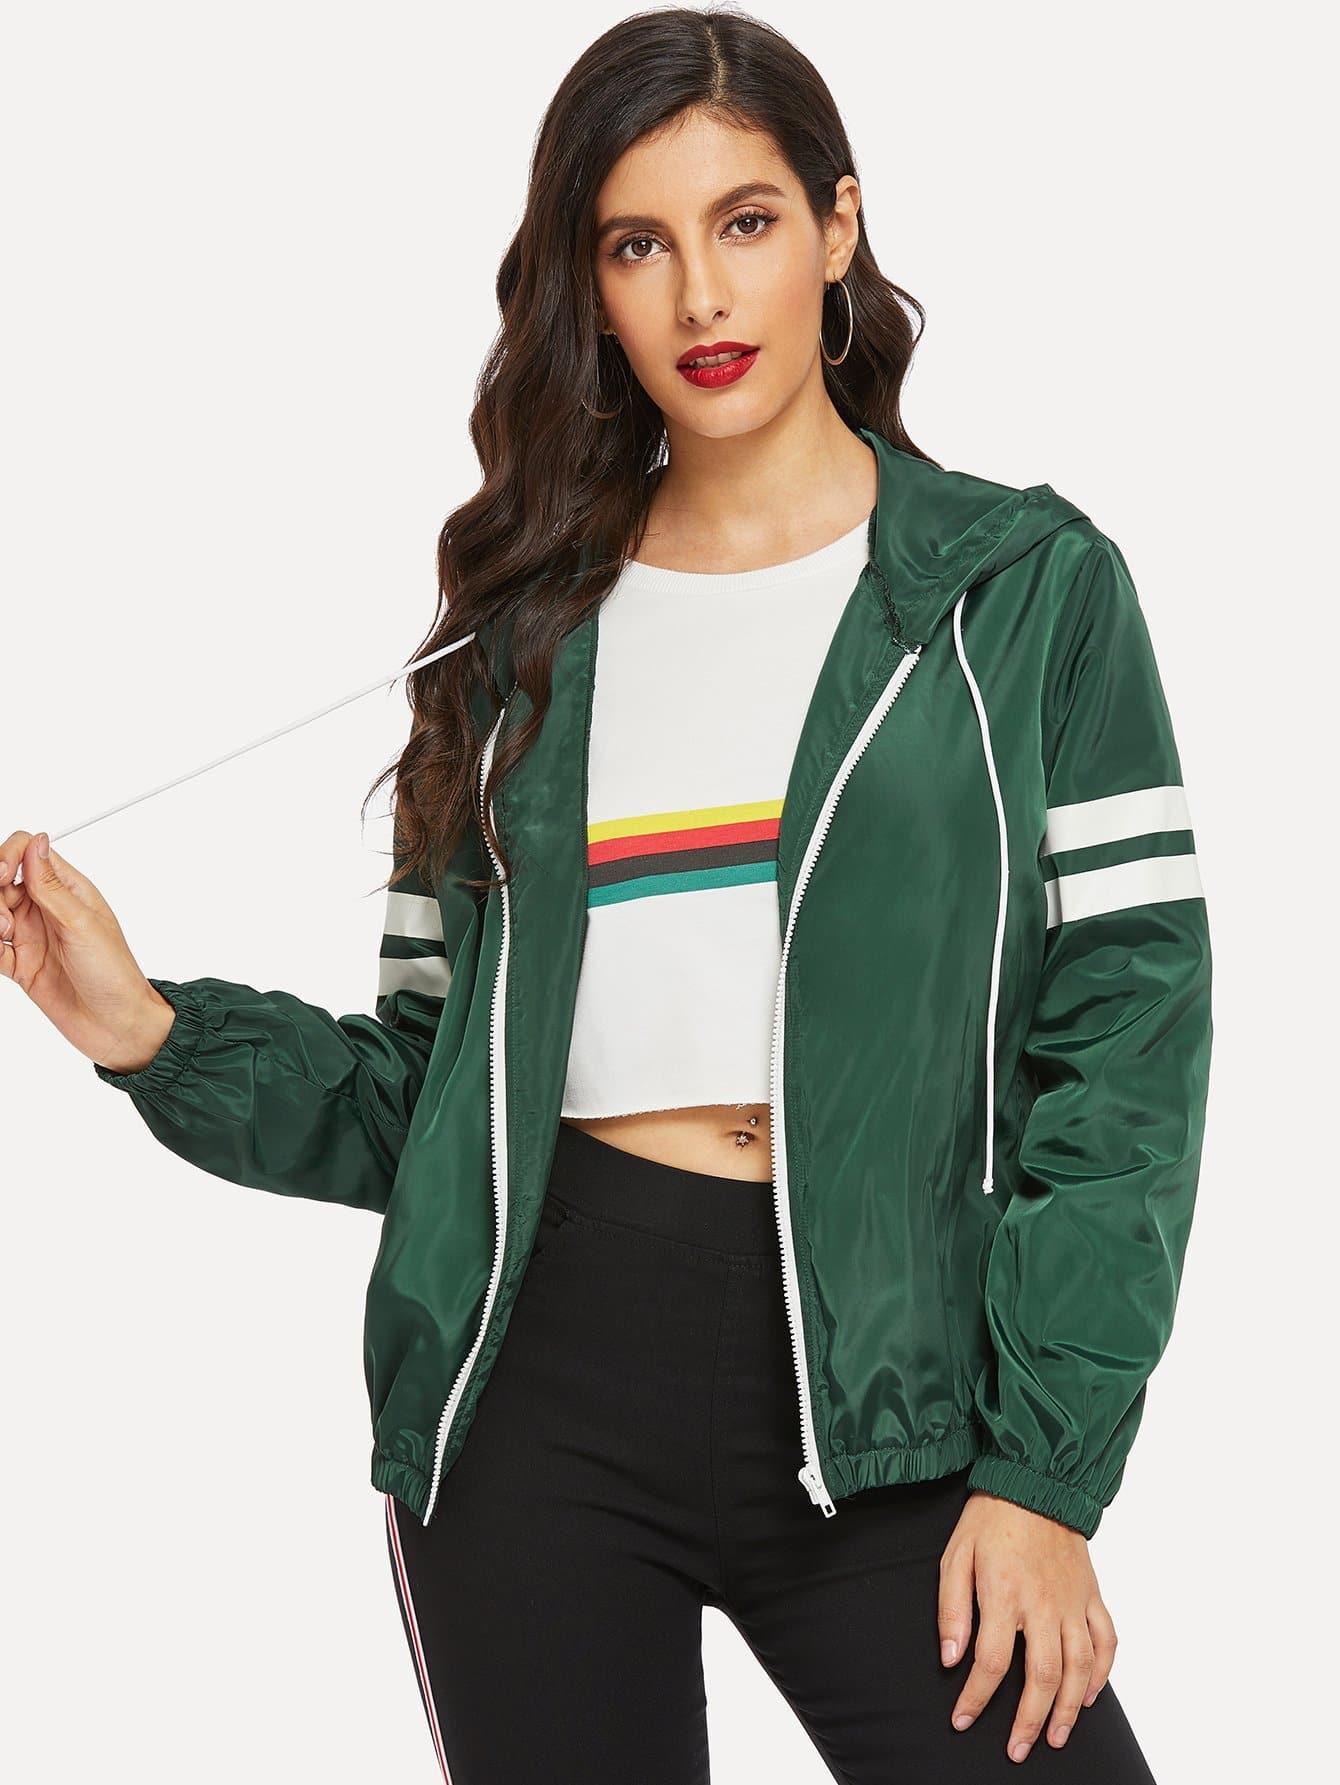 Фото - Контрастная куртка с капюшоном на молнии от SheIn зеленого цвета